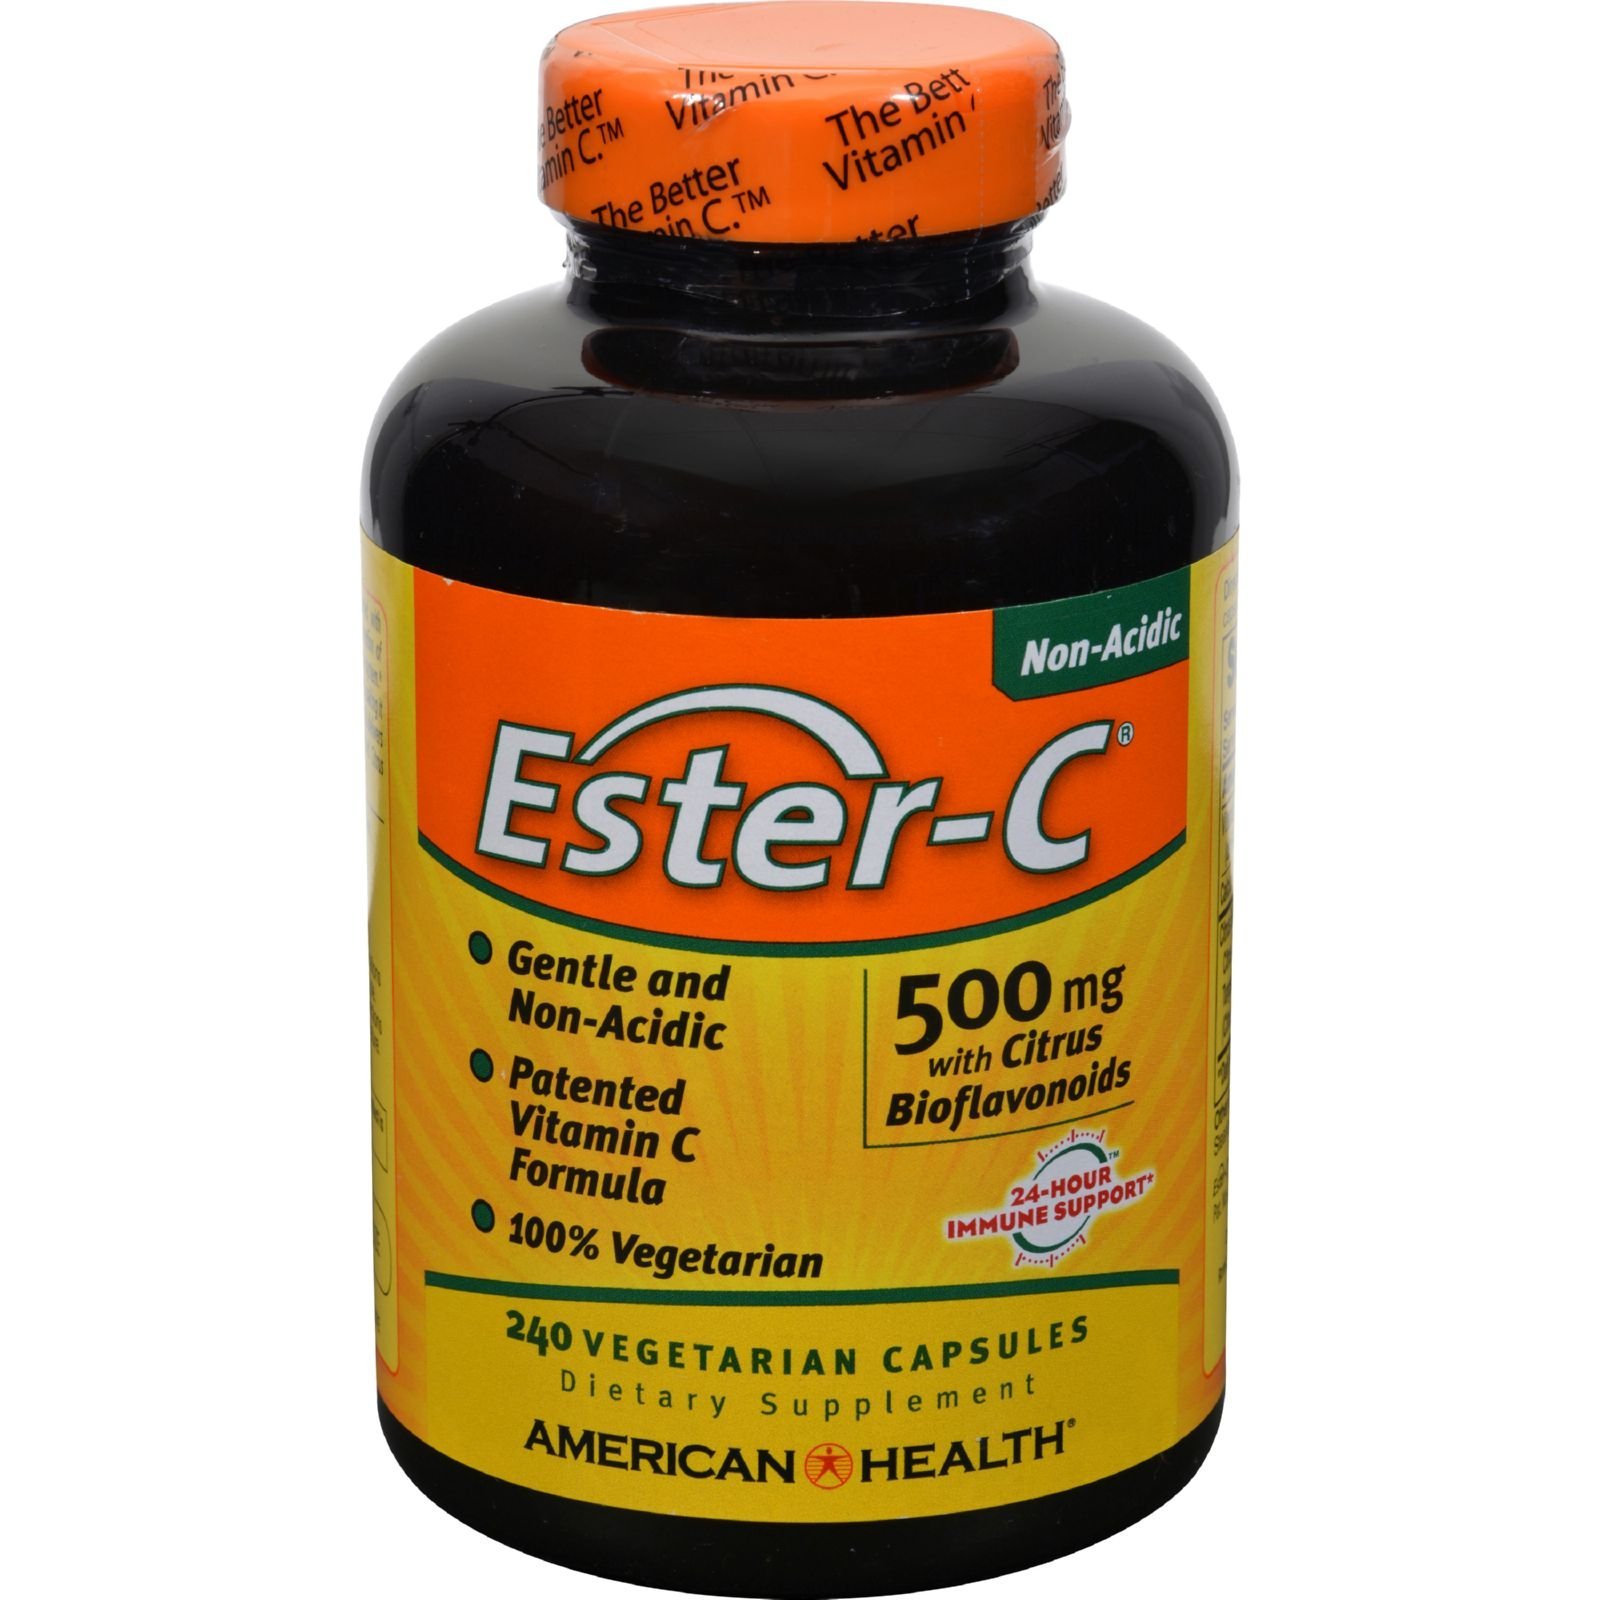 4 Pack of American Health Ester-C with Citrus Bioflavonoids - 500 mg - 240 Vegetarian Capsules - - -